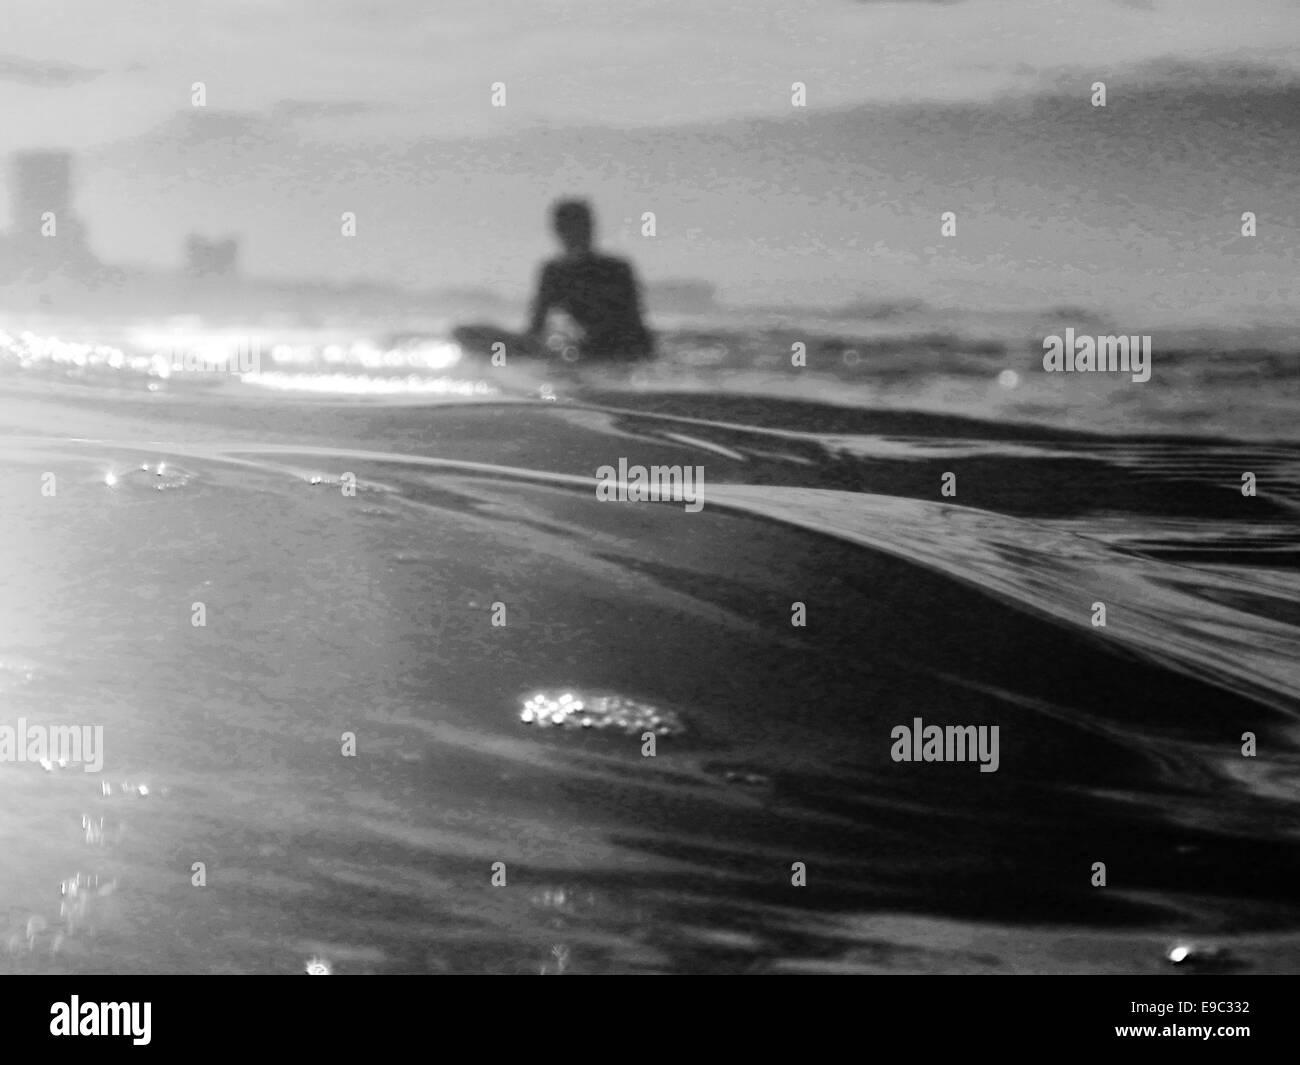 Surfer in attesa di onda in ocean BW Immagini Stock